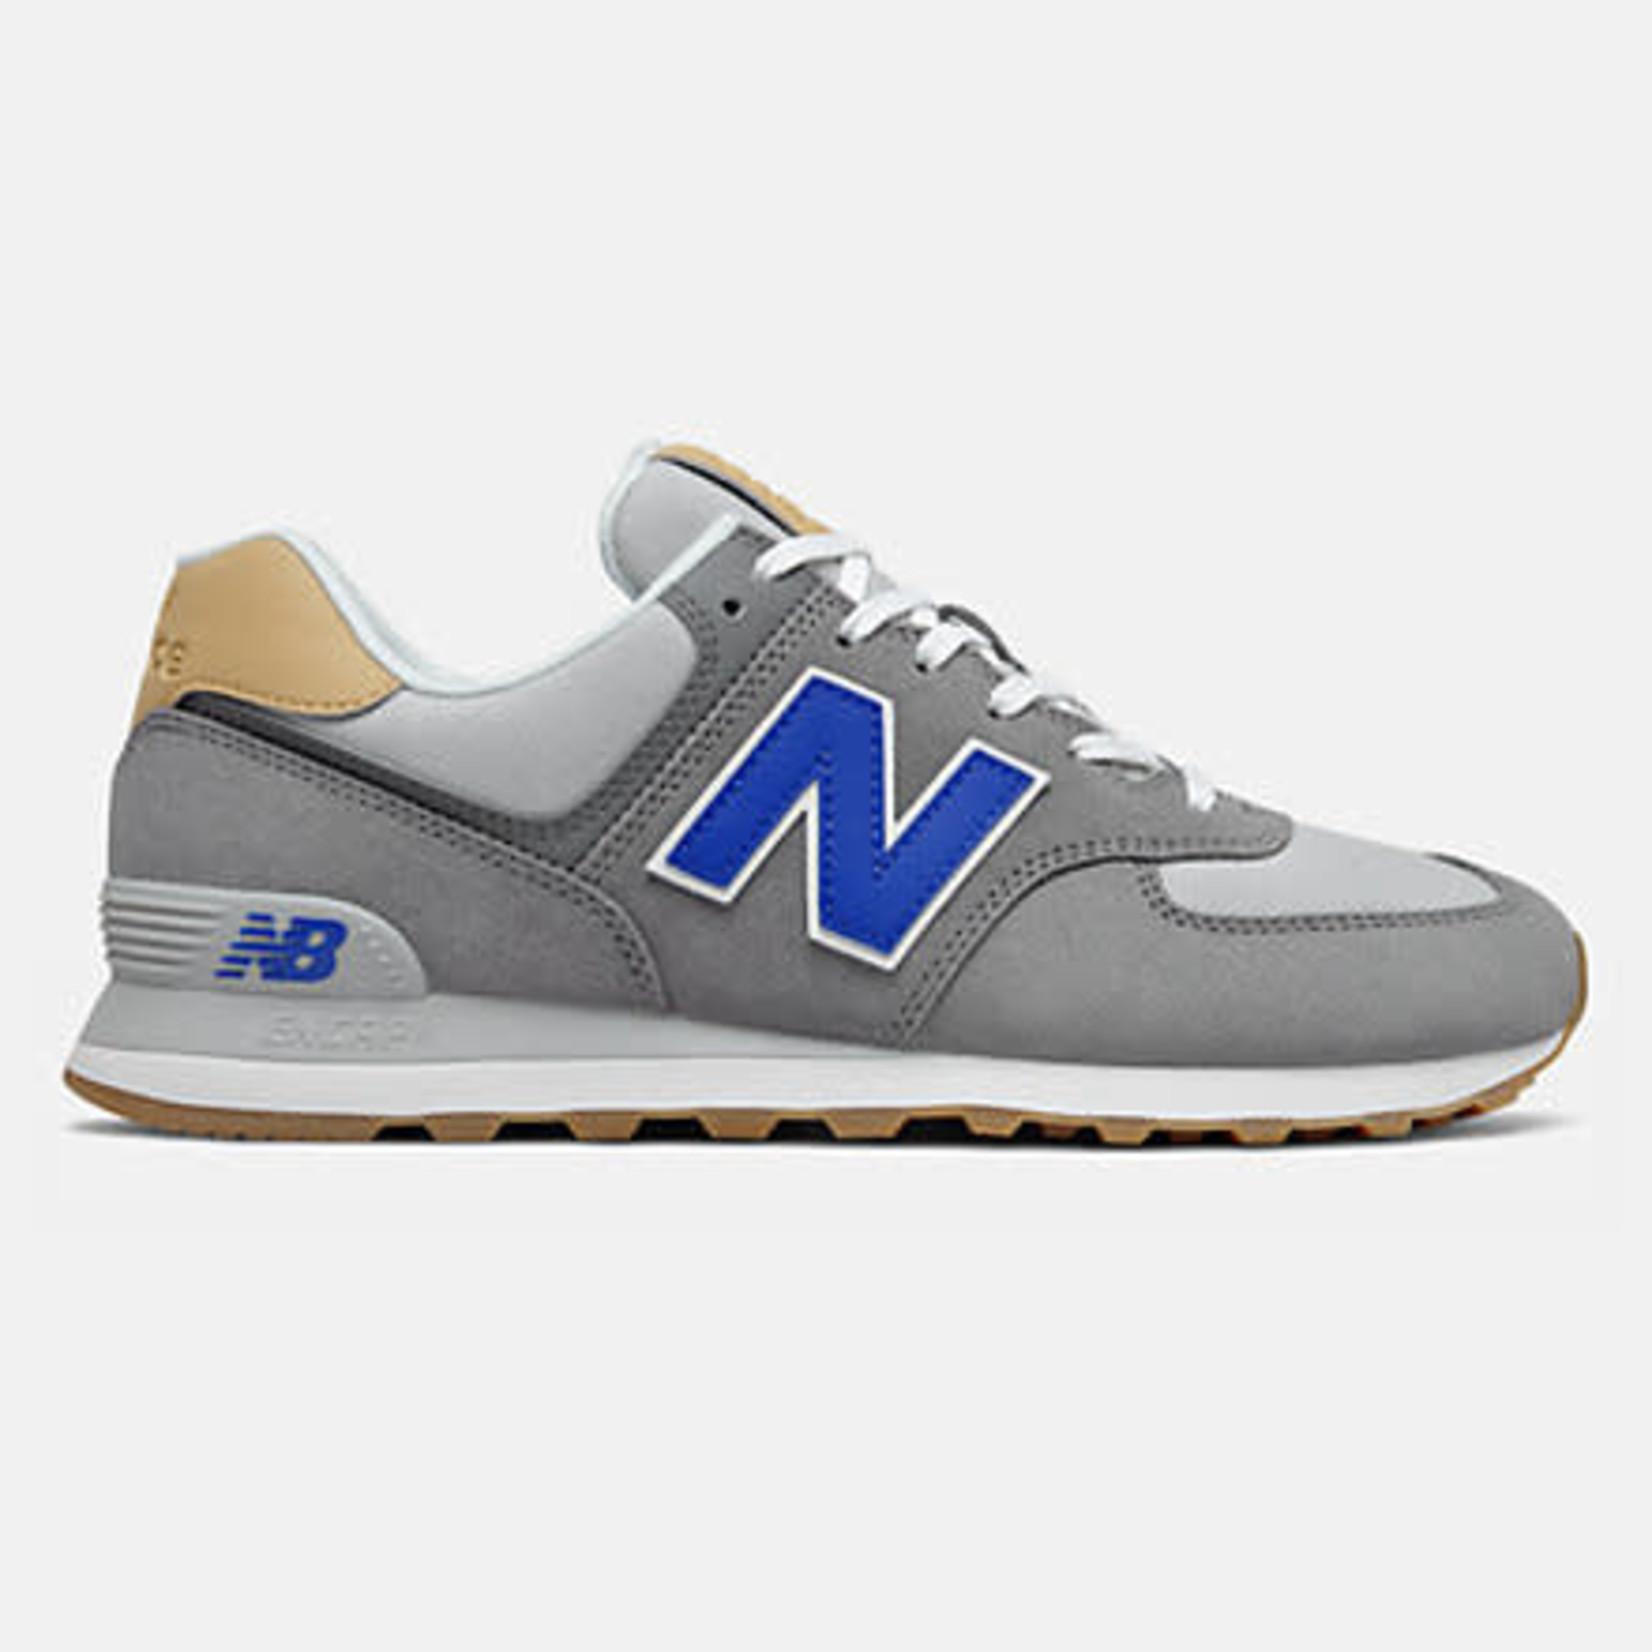 New Balance New Balance Casual Shoes, ML574NE2, Mens